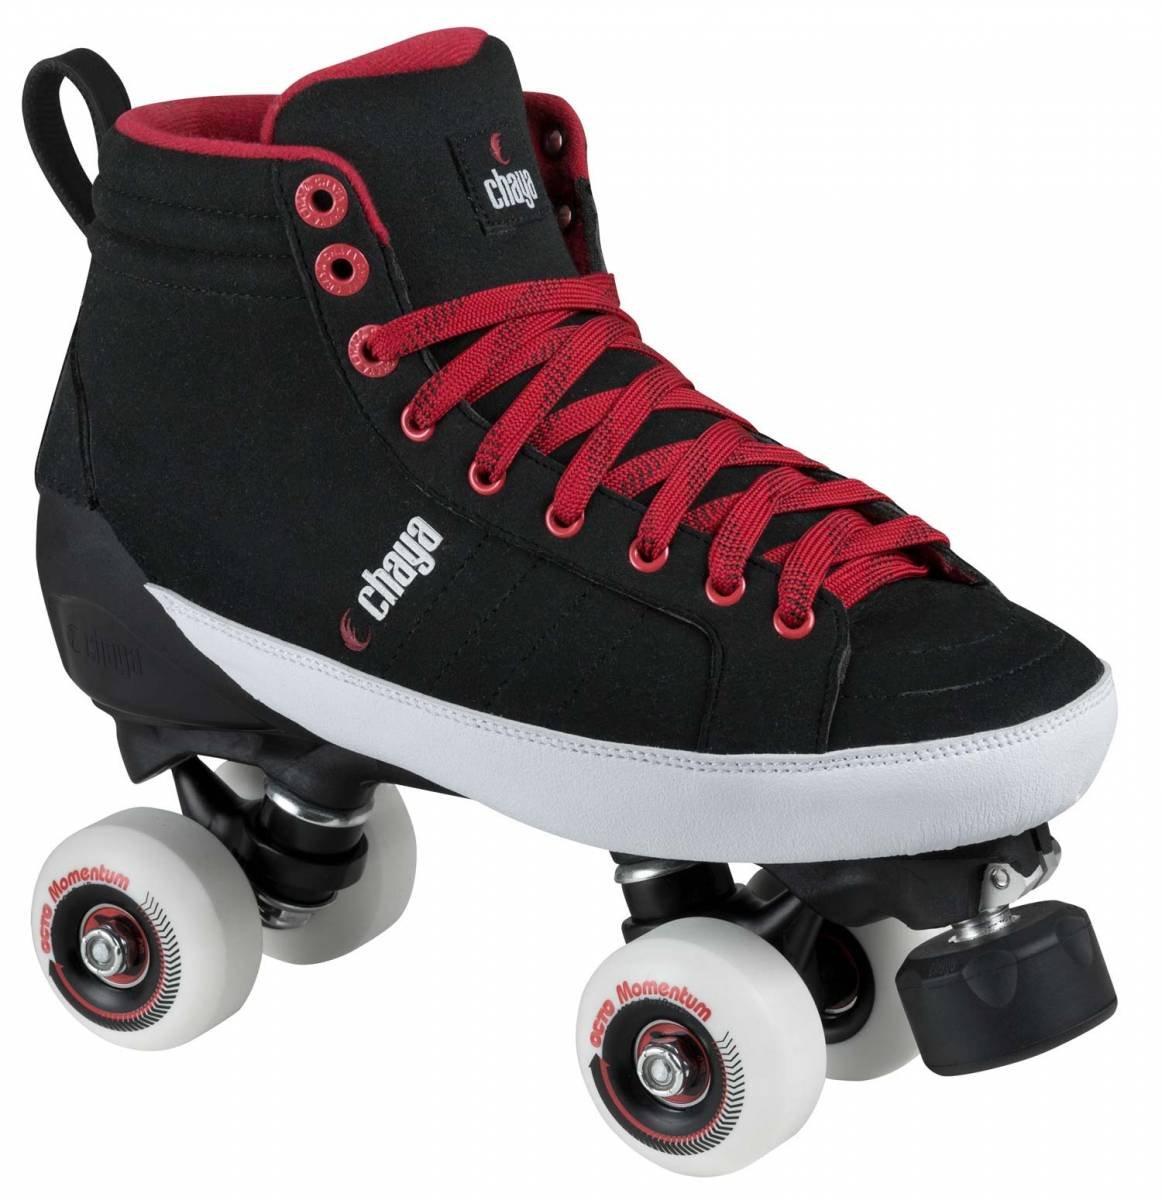 Chaya Karma Outdoor Park Roller Skate with Dual Center Mounting (EU 41 / US 9)